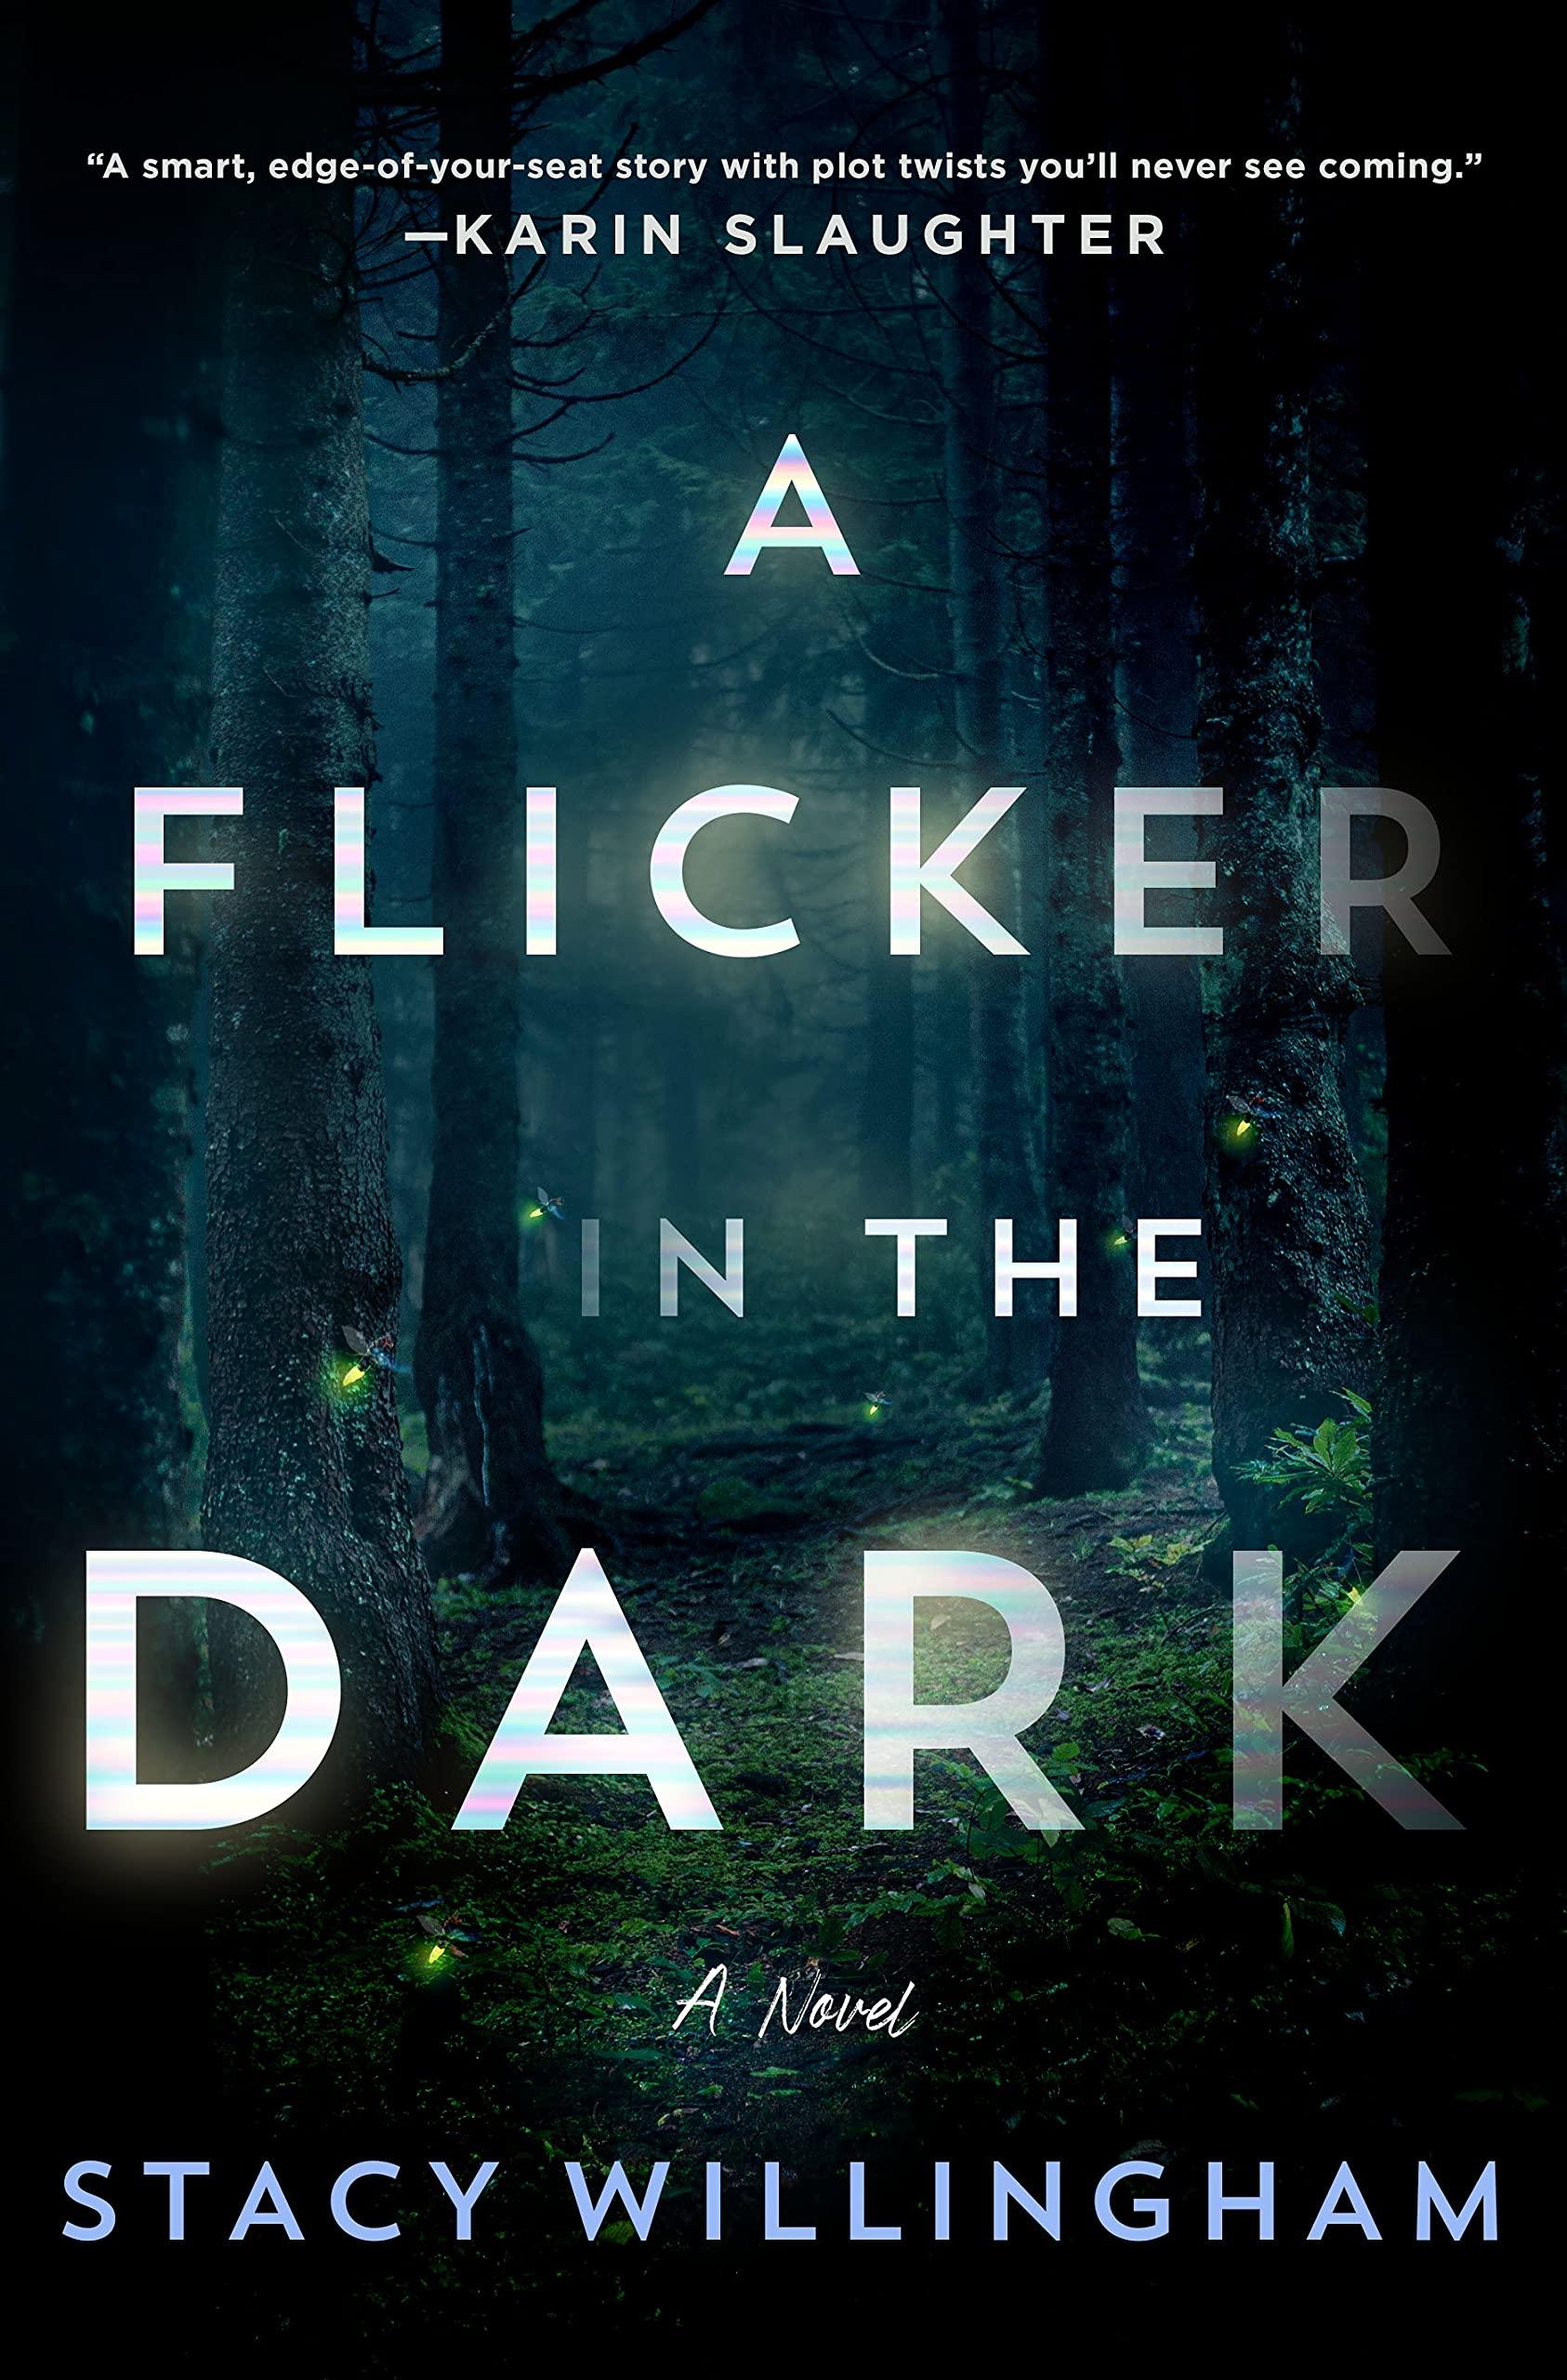 Amazon.com: A Flicker in the Dark: 9781250803825: Willingham, Stacy: Books